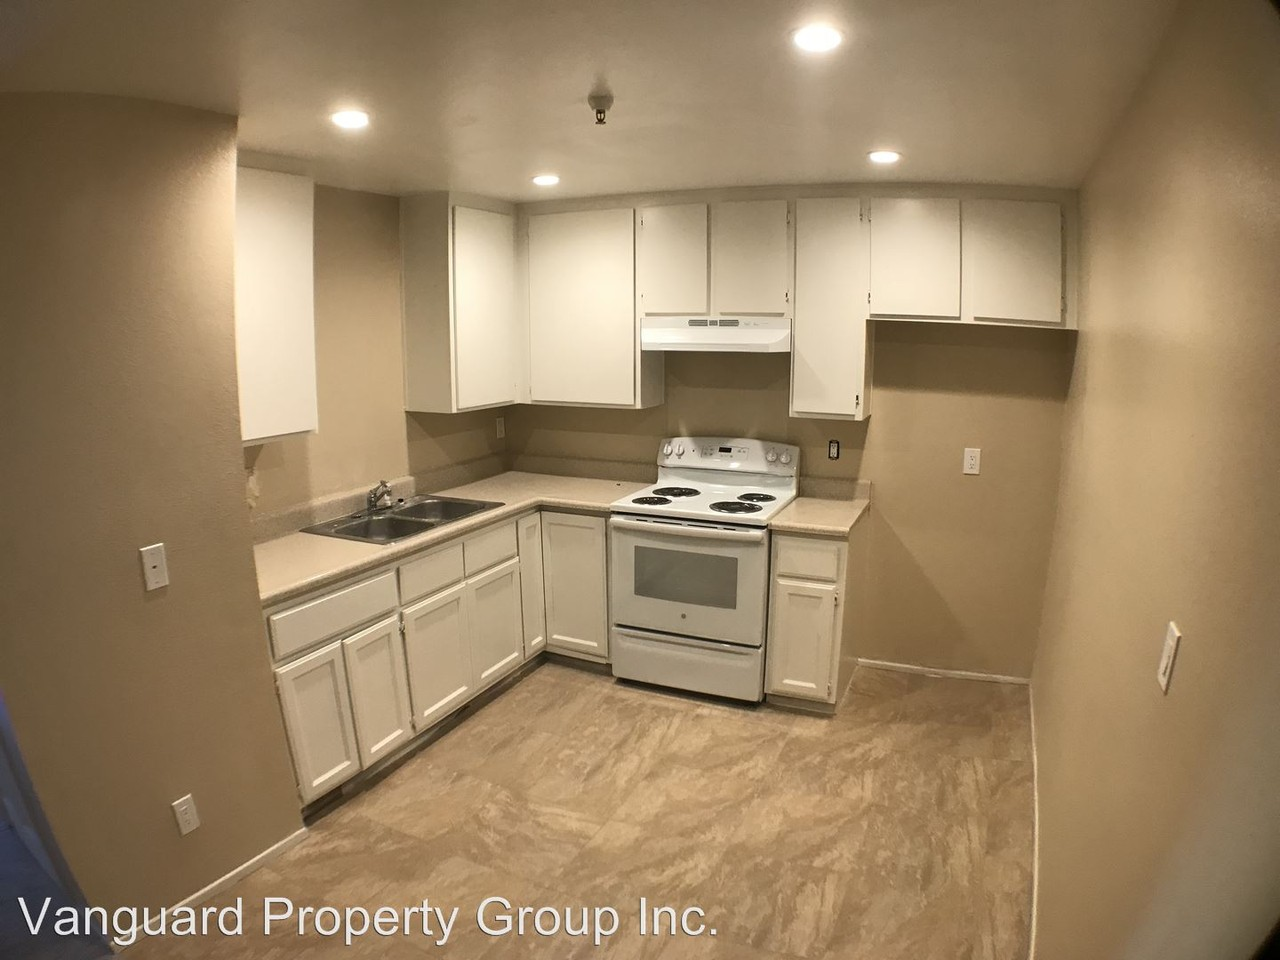 412 N Baker St, Santa Ana, CA 92703 - Apartment for Rent | PadMapper